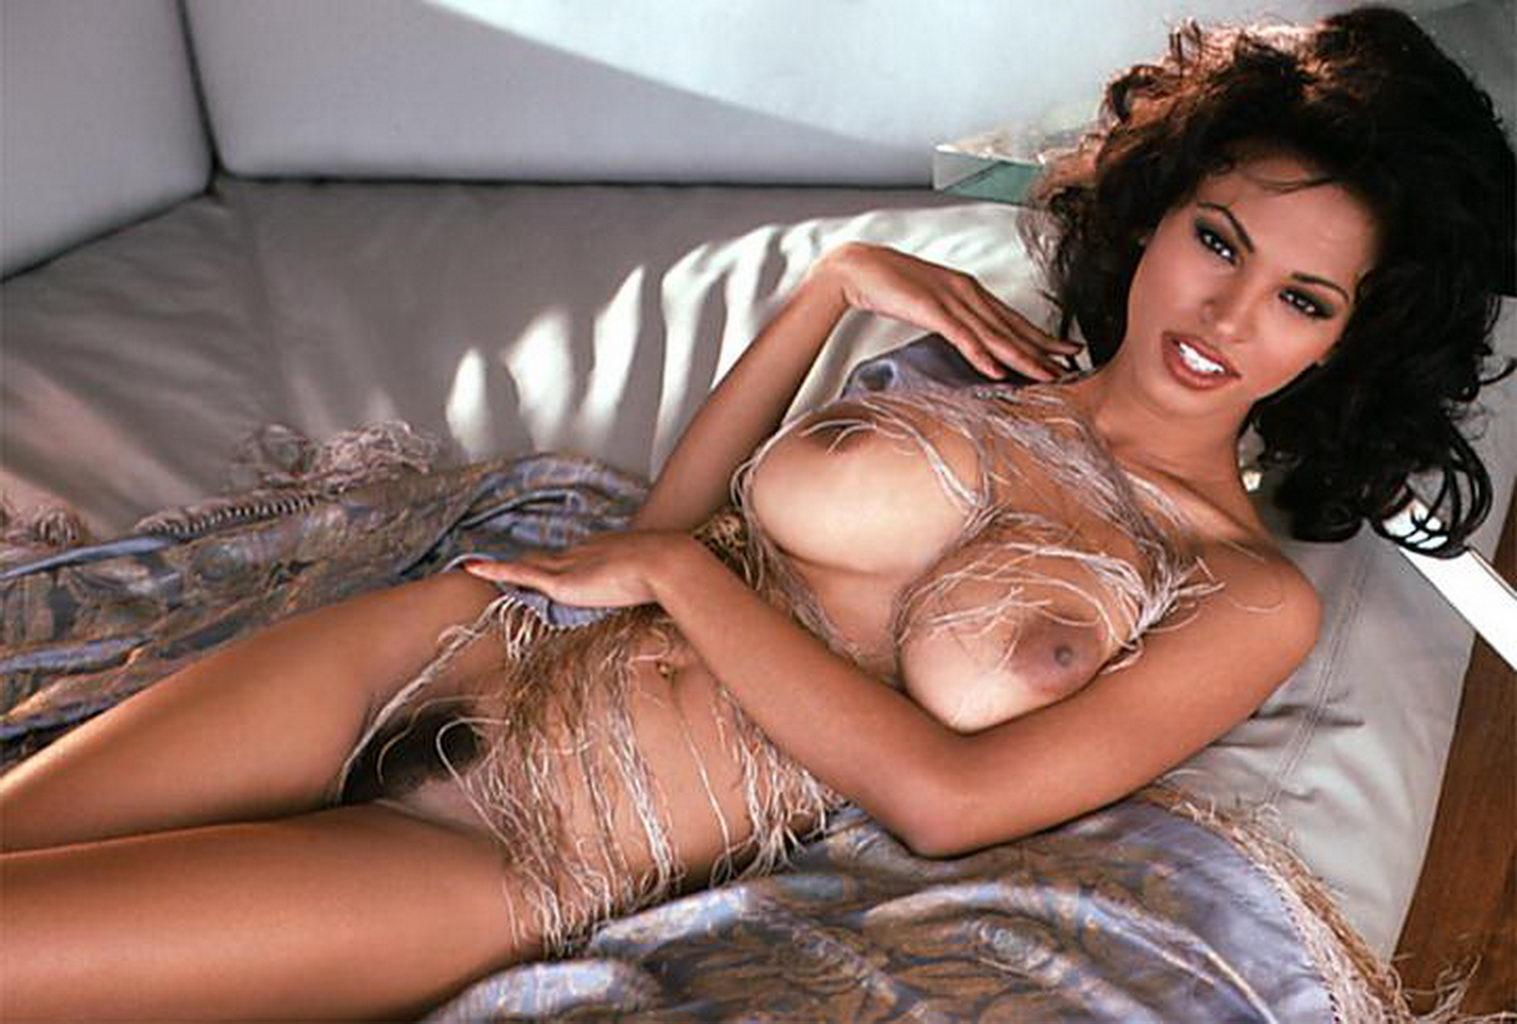 Irish mccalla nude